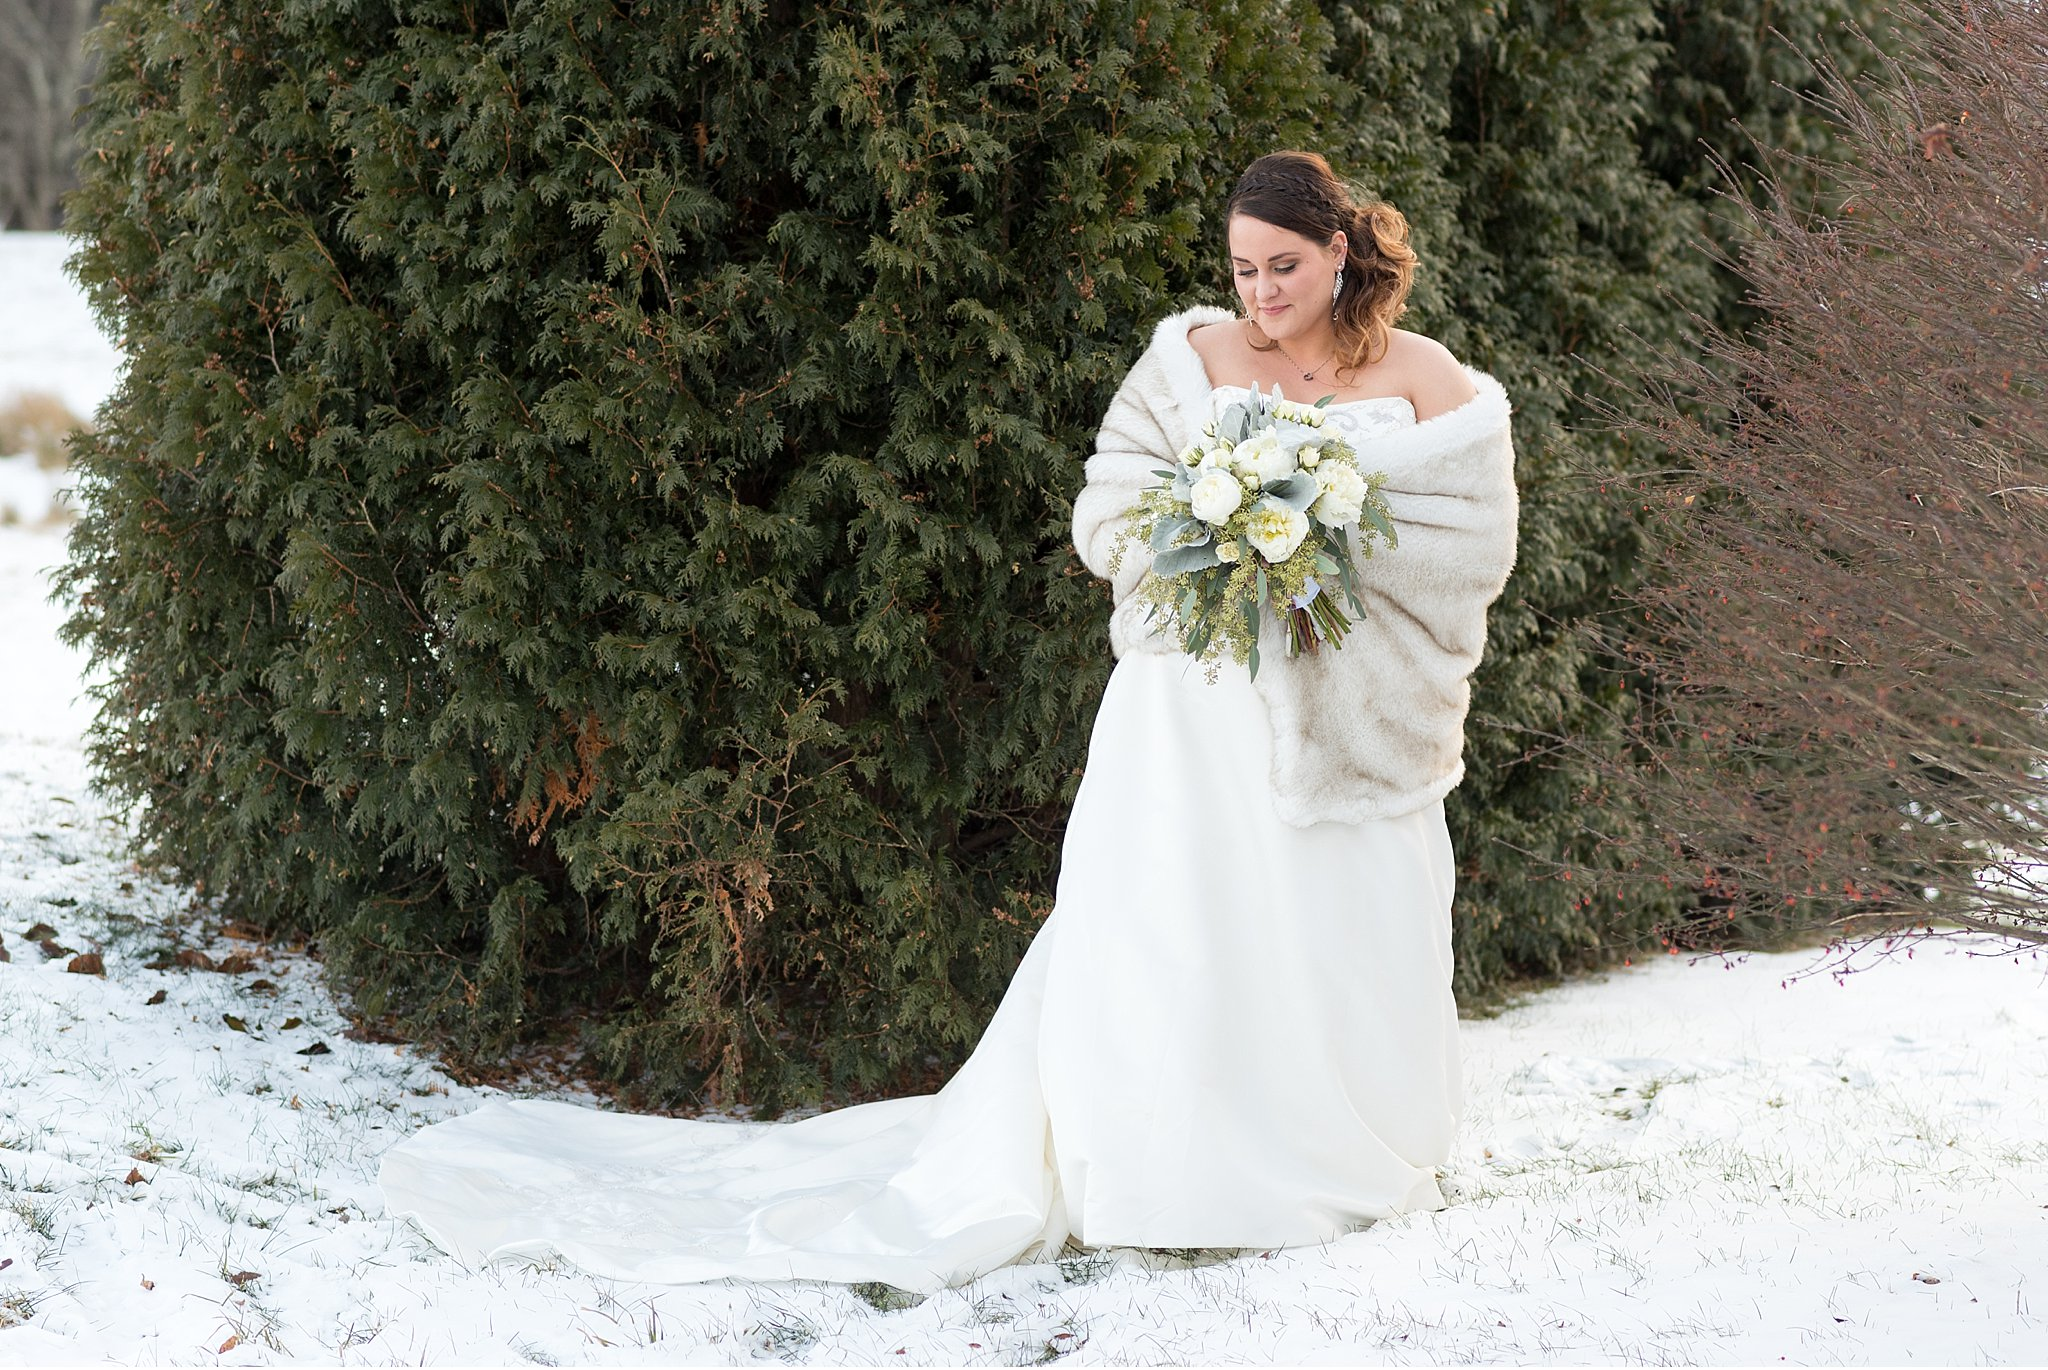 Winter elopemen snow covered vow exchange Coudersport PA photo_0579.jpg